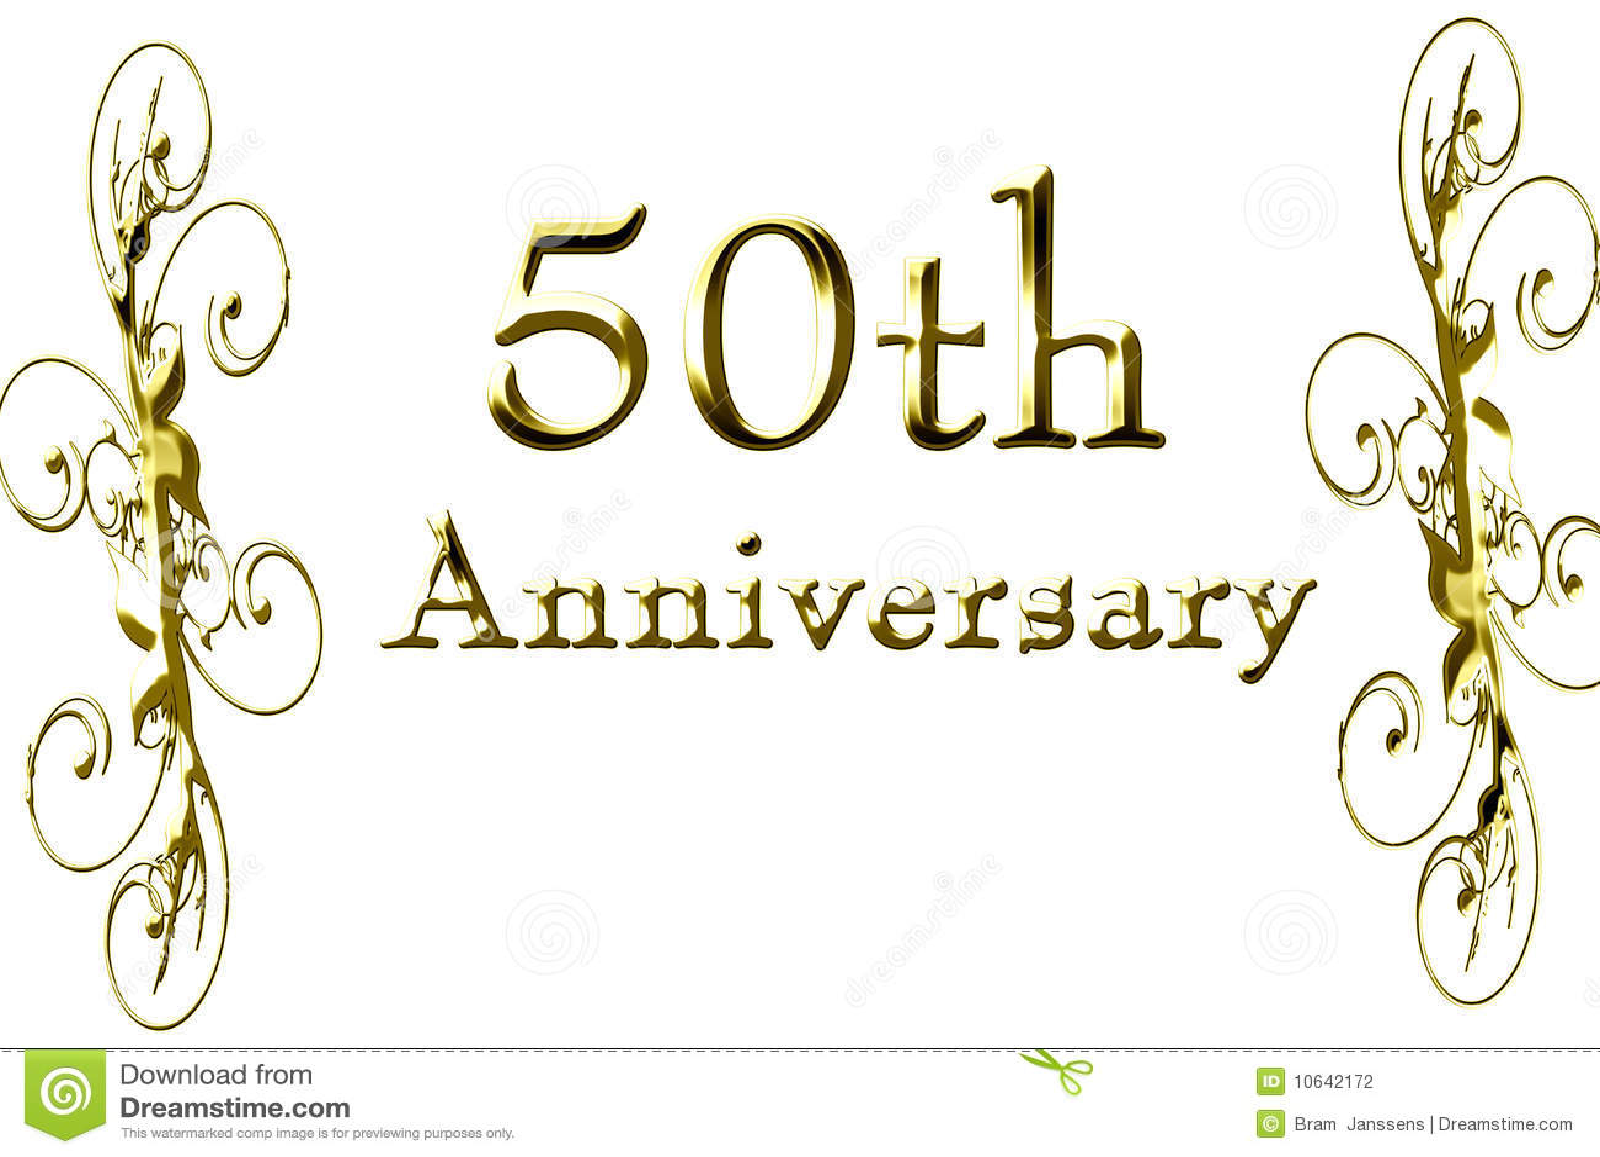 Th anniversary stock illustration image of design